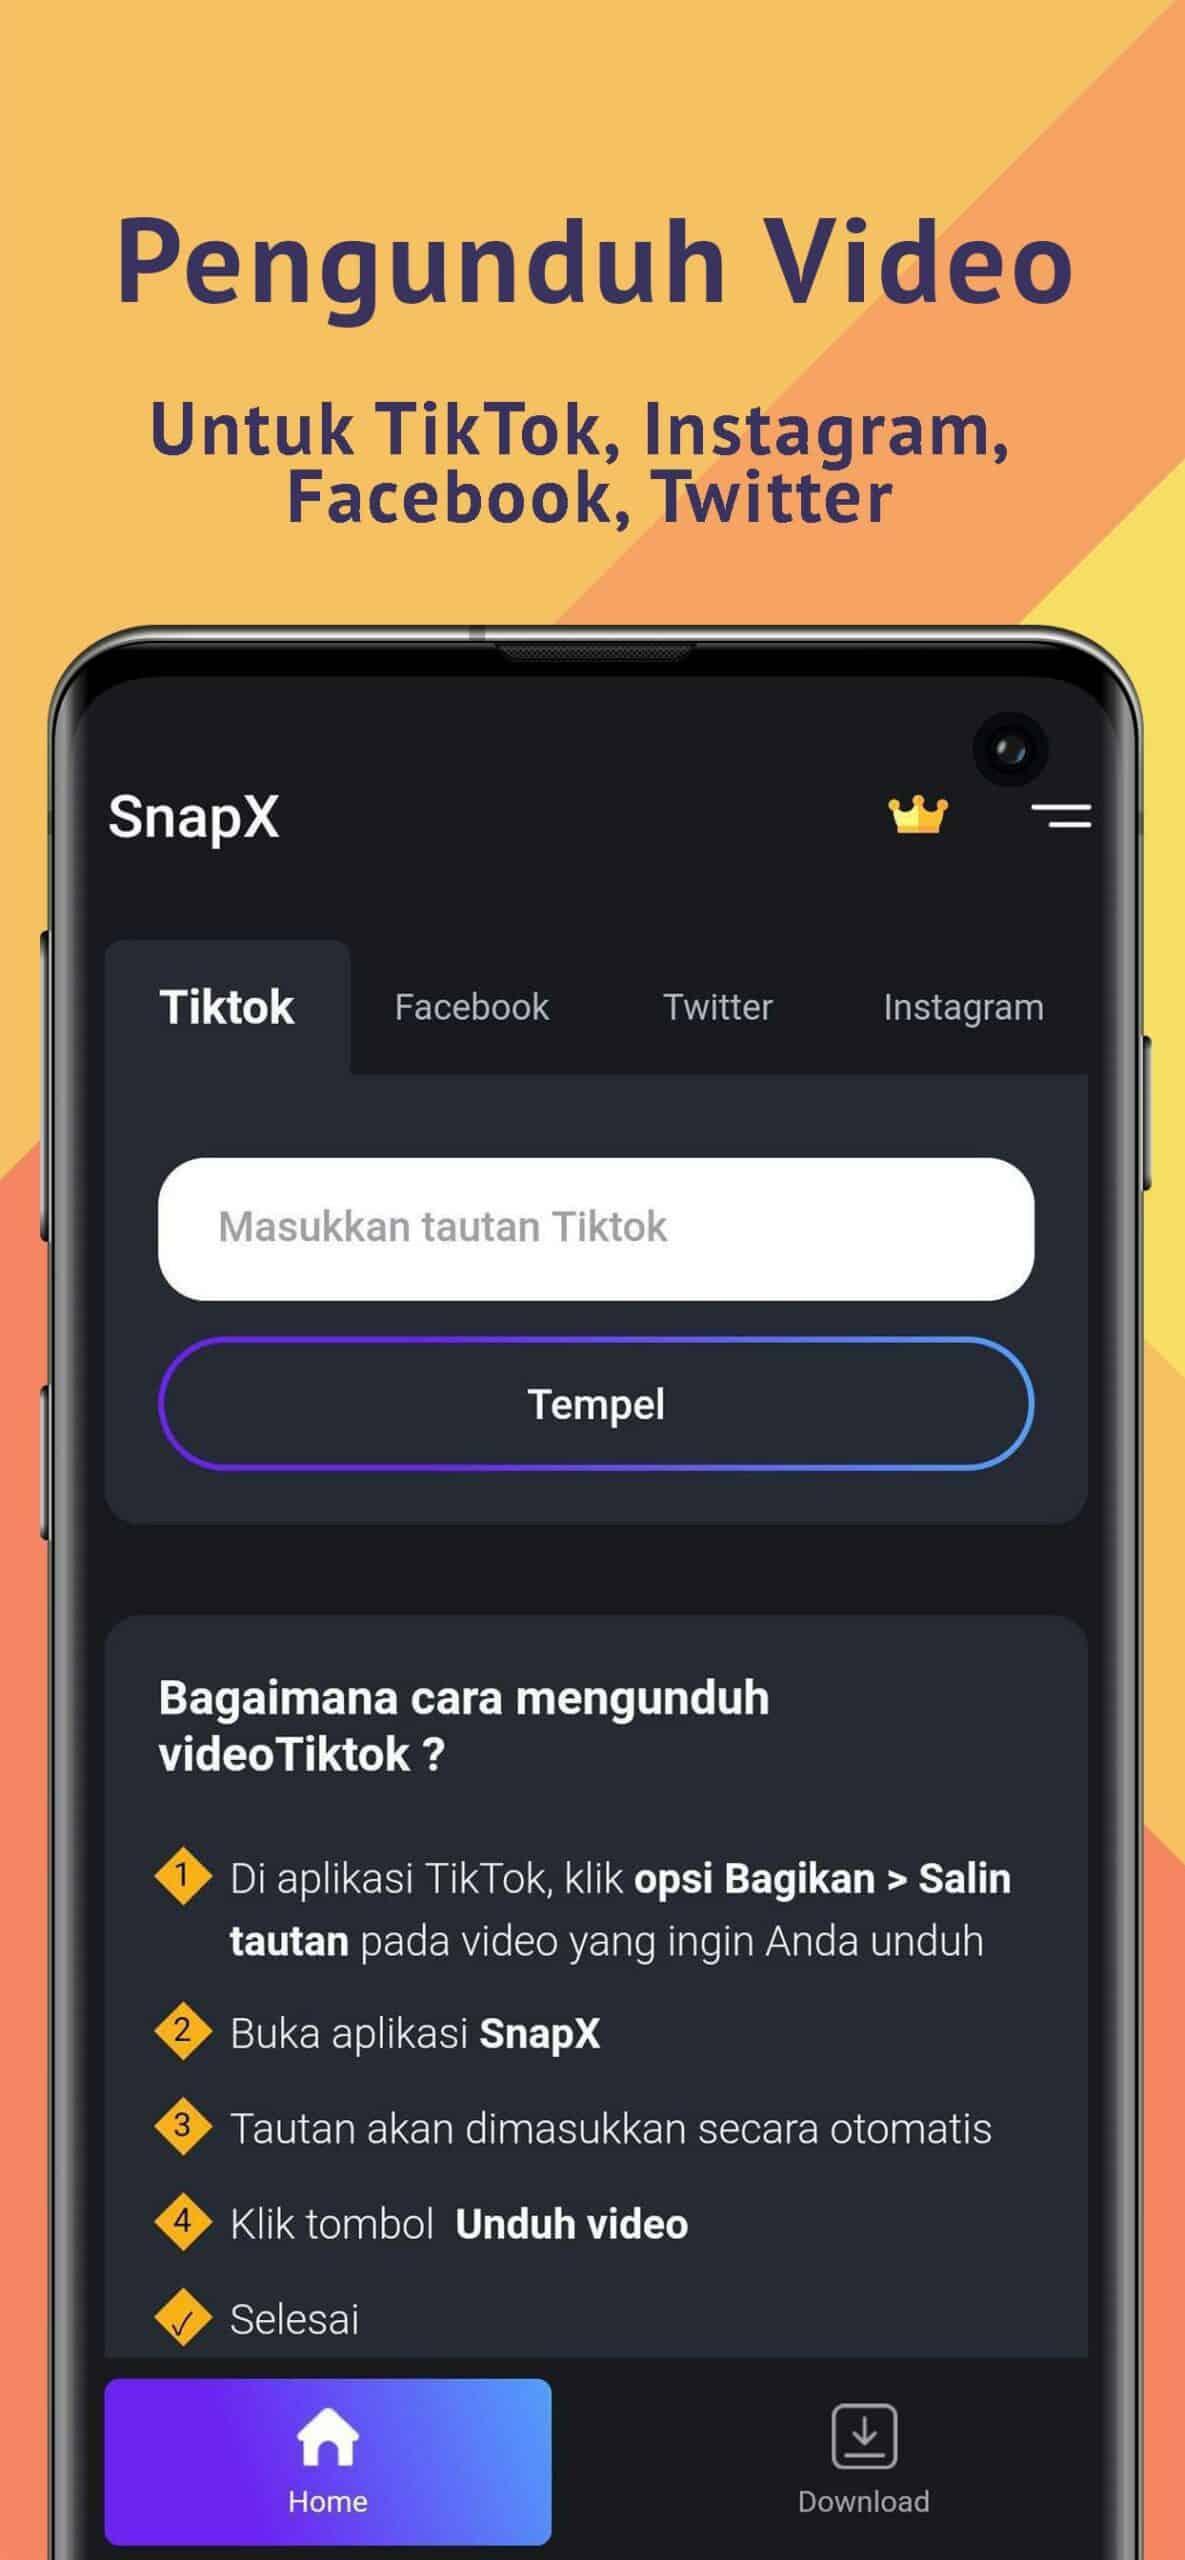 Setelah-aplikasi-SnapX-terpasang-di-ponsel-jalankan-aplikasi-SnapX-Link-yang-tadi